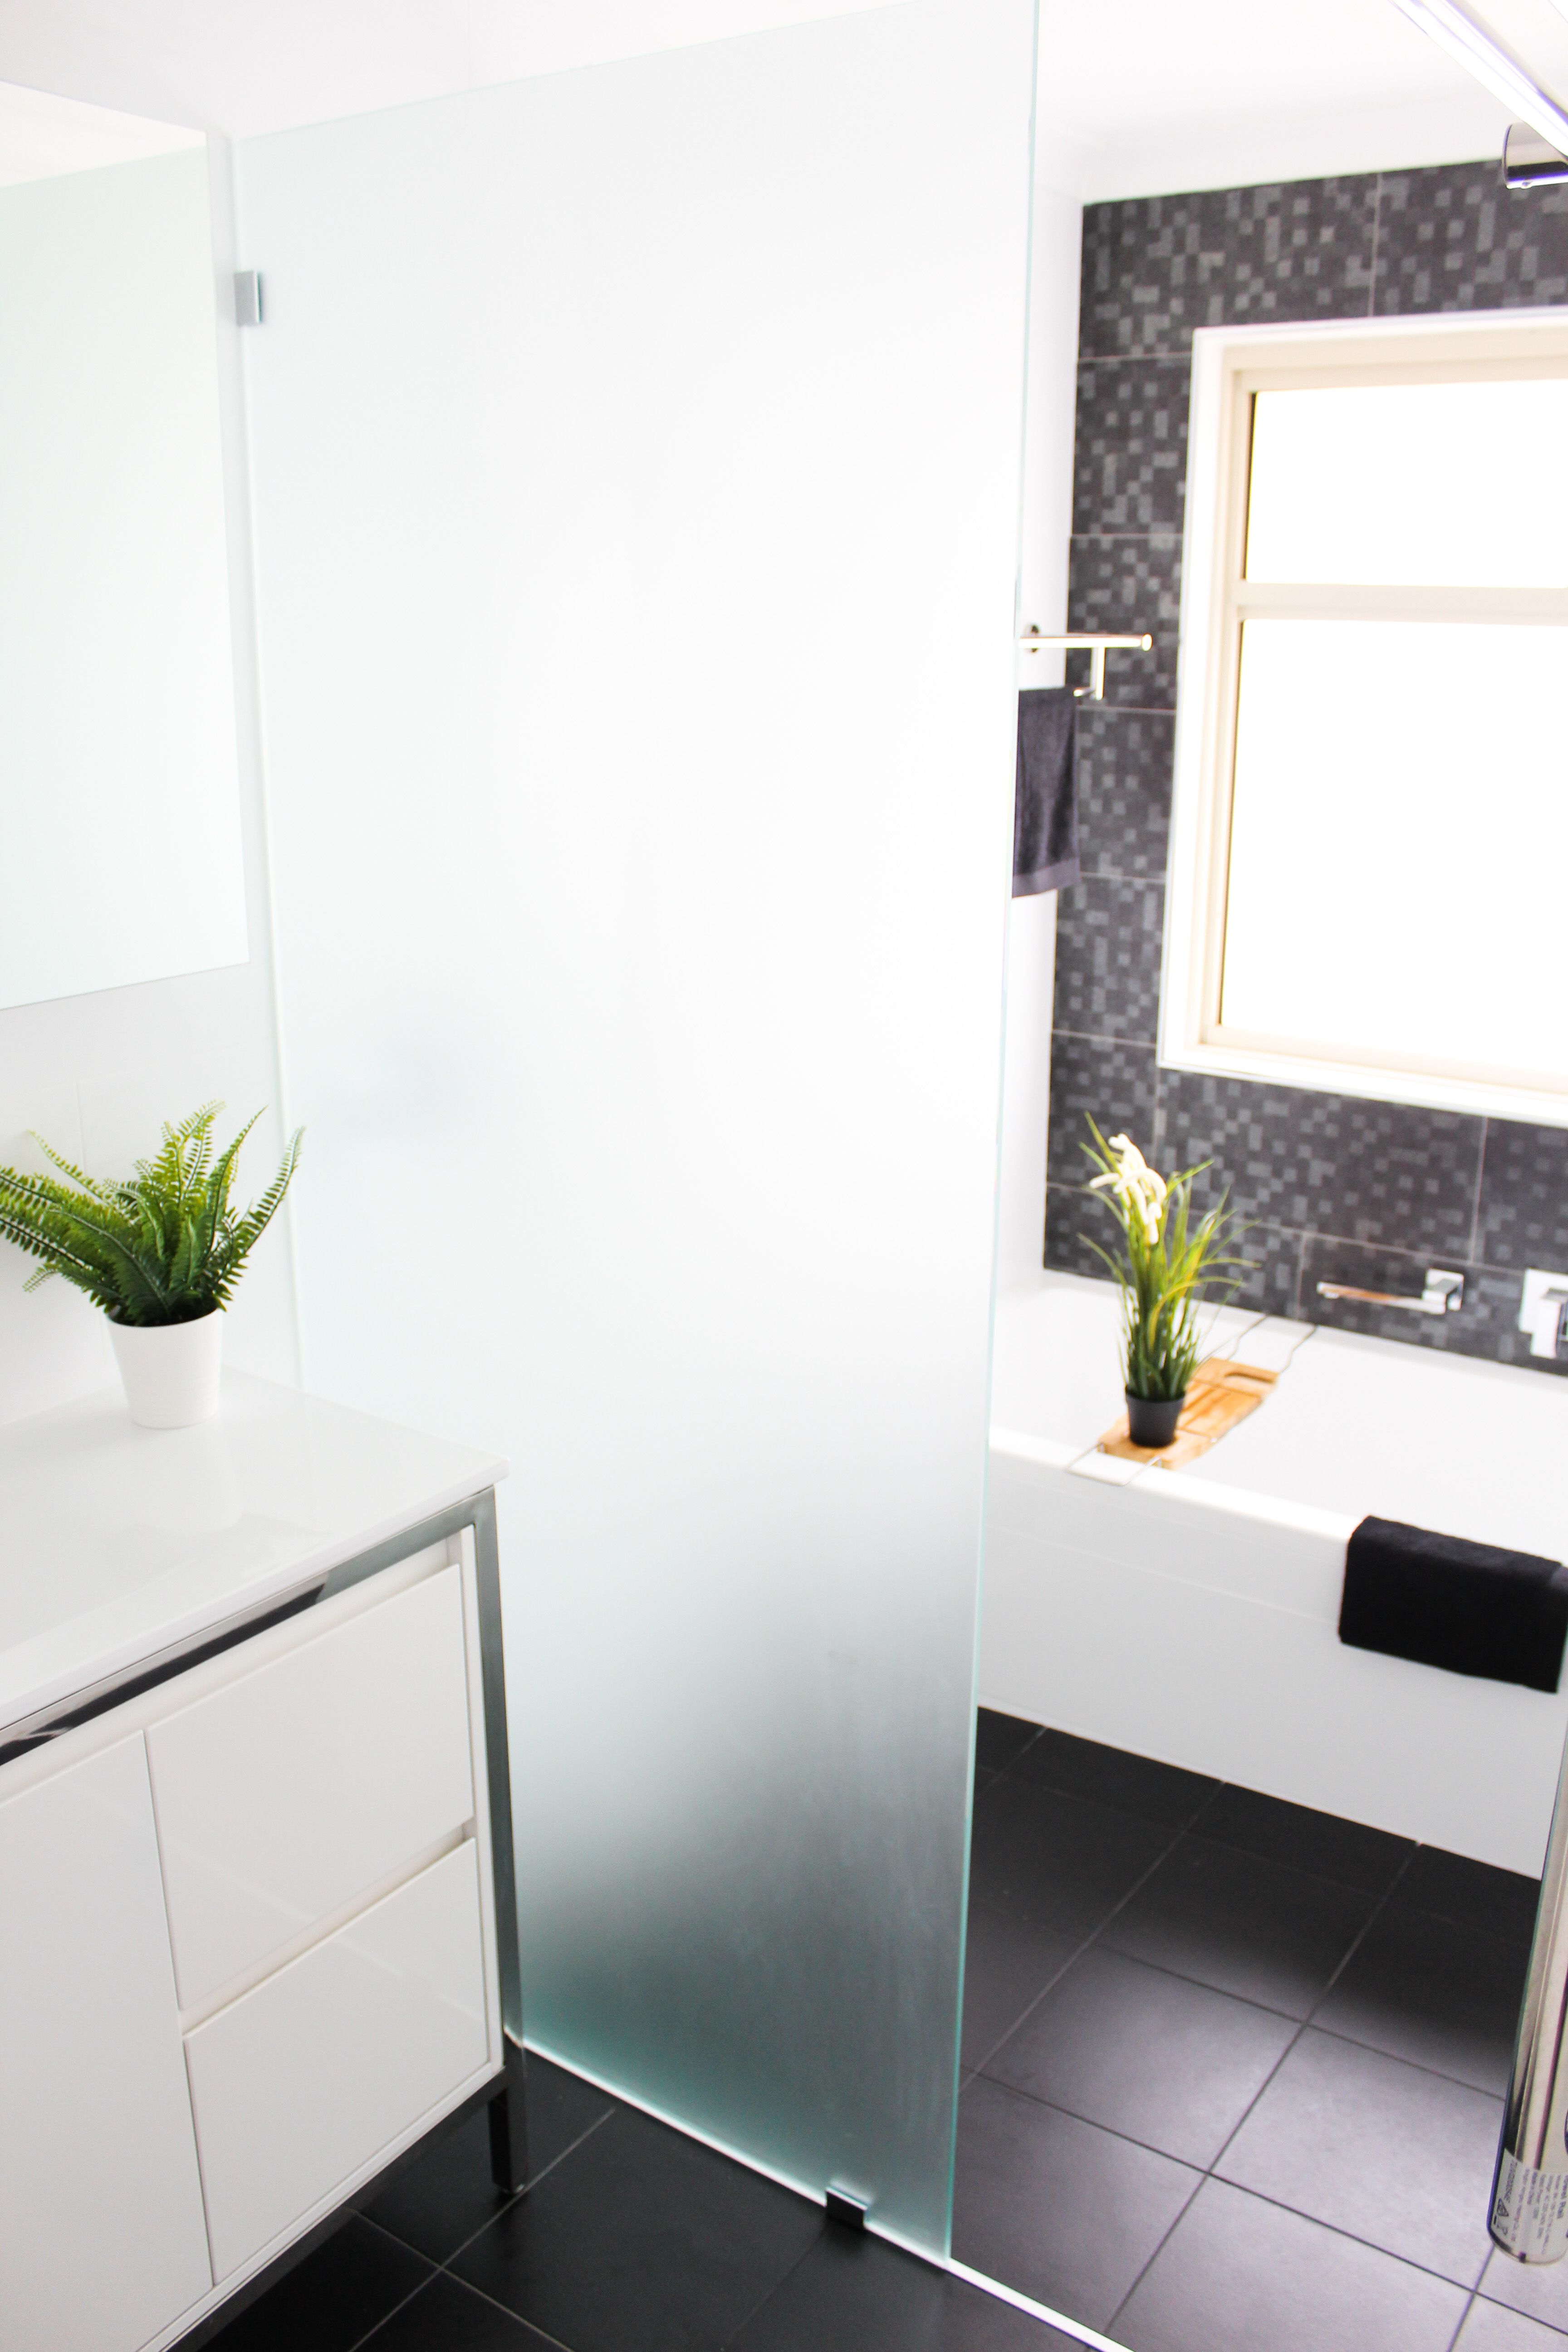 Walk In Wet Room Designs: Walk In Shower Black Feature Wall Drop In Bath Wet Room